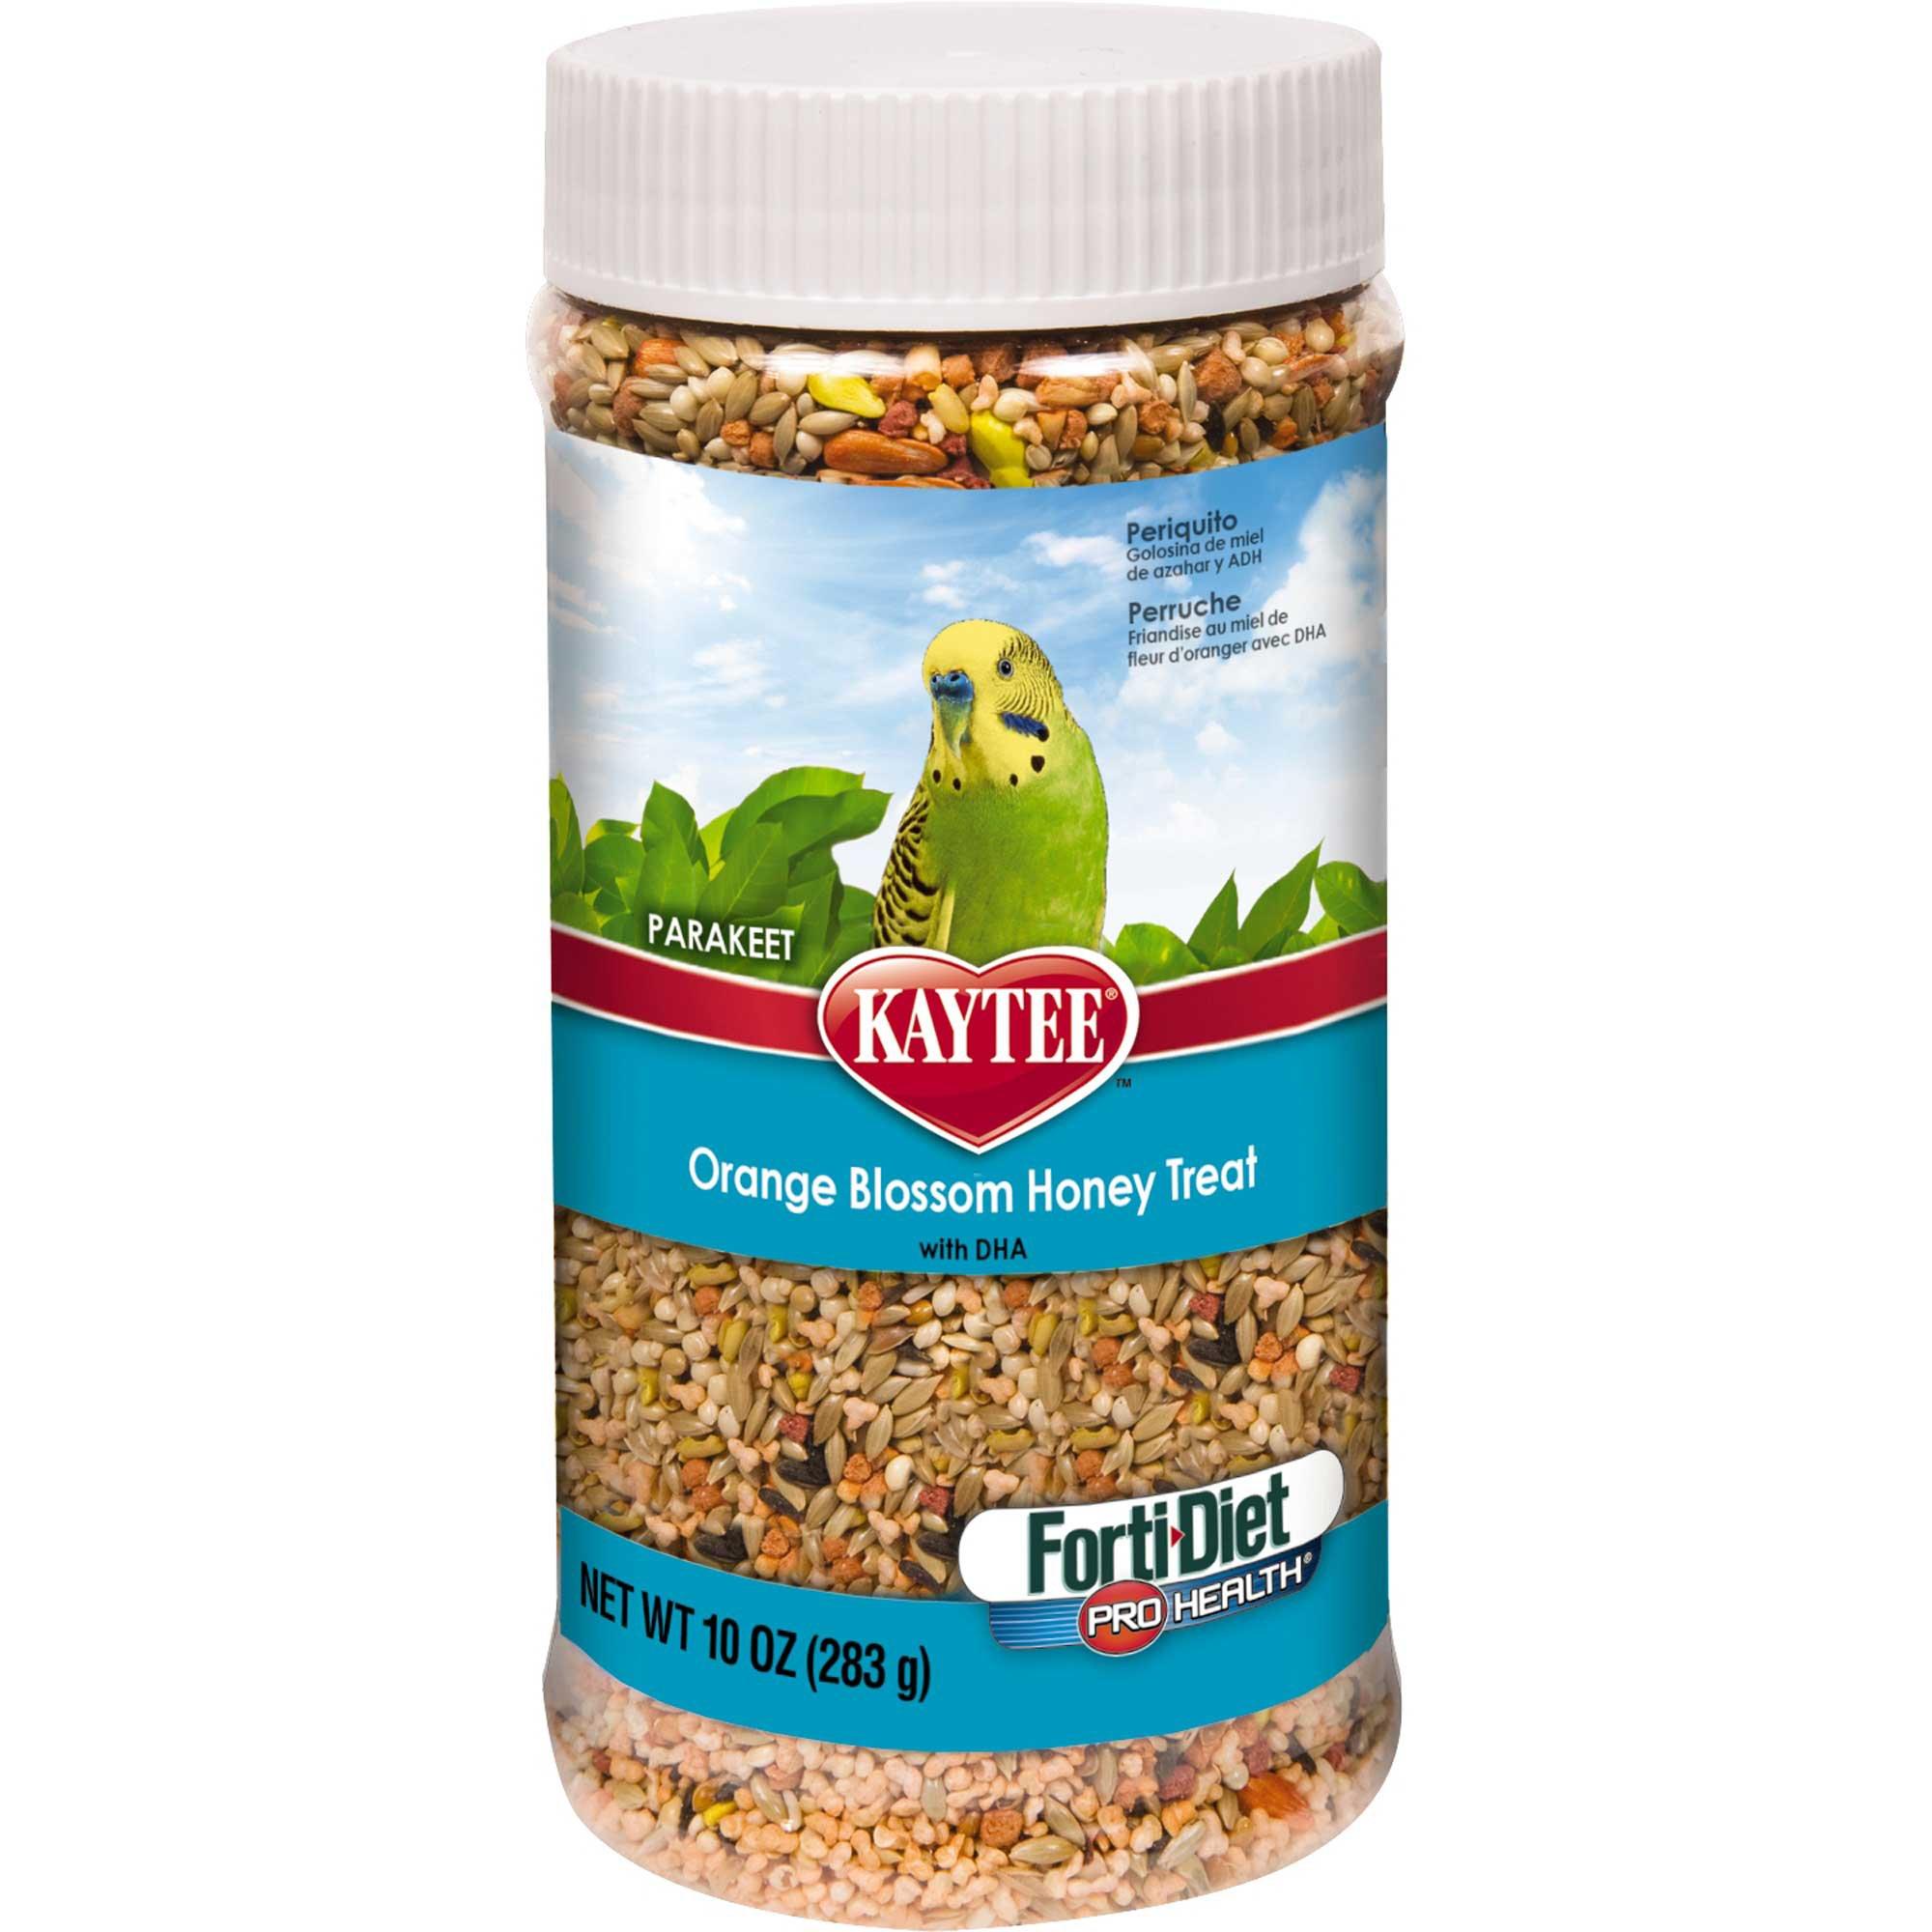 Kaytee Forti-Diet Pro Health Orange Blossom Honey Parakeet Treats